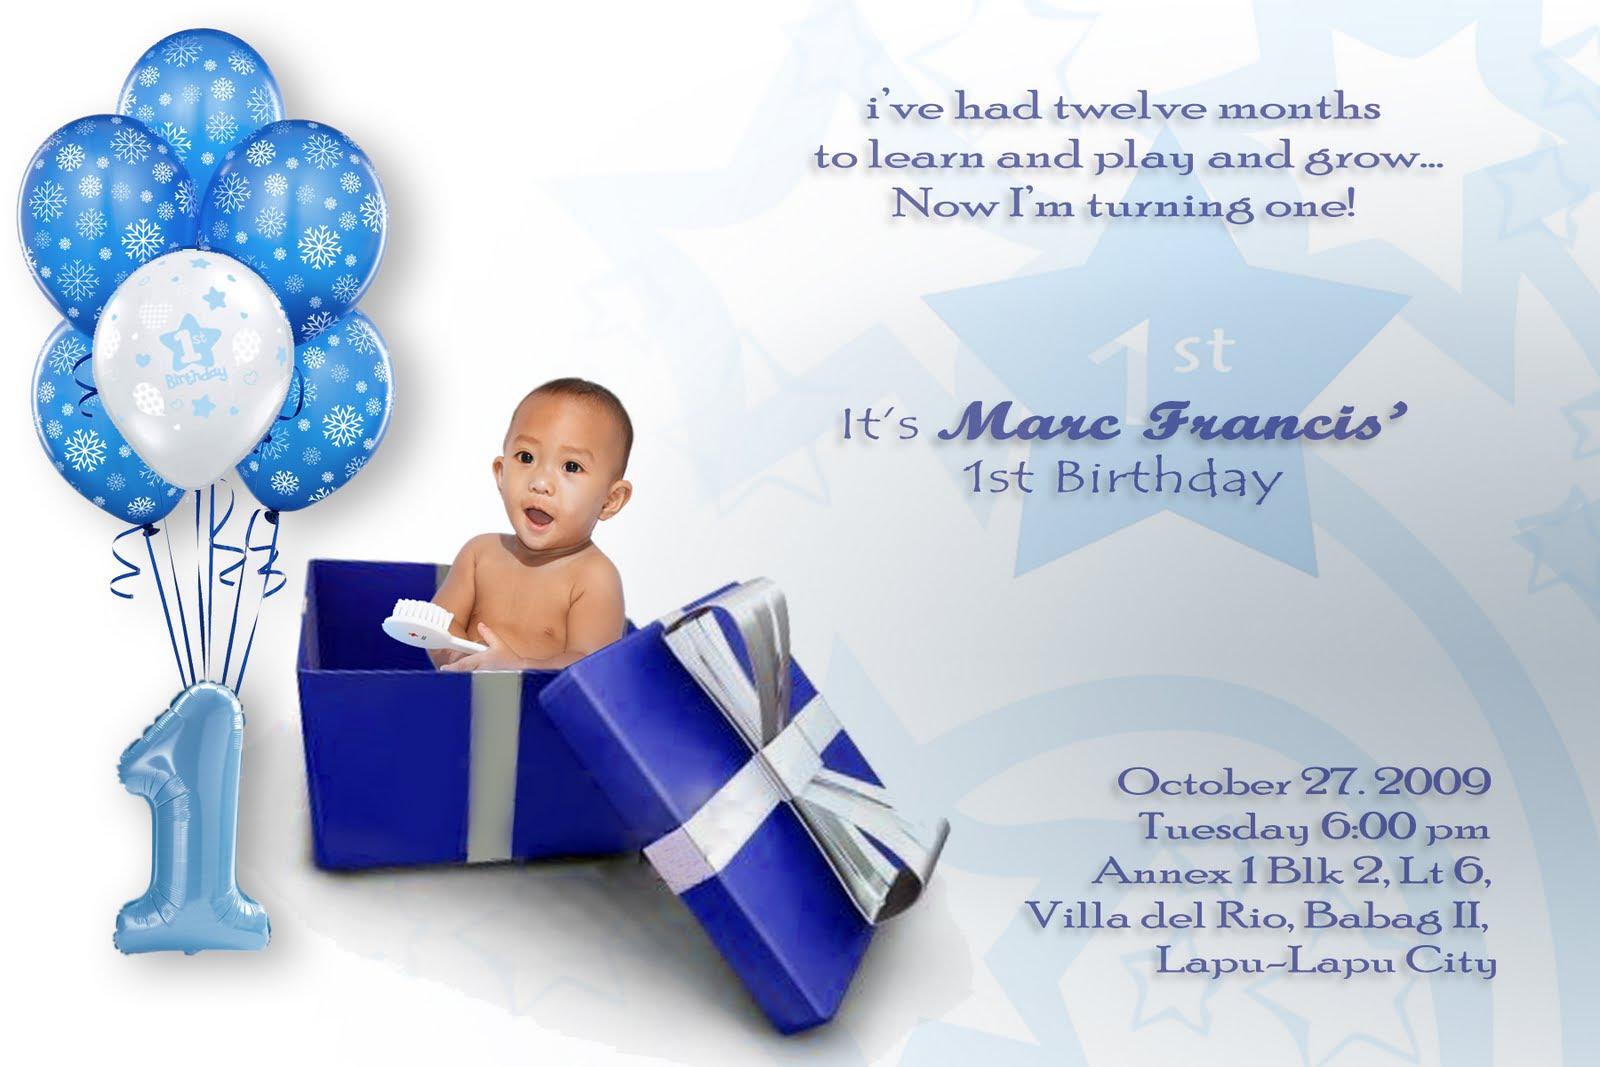 Invitation Card Design For 1 Year Old Birthday Old Birthday